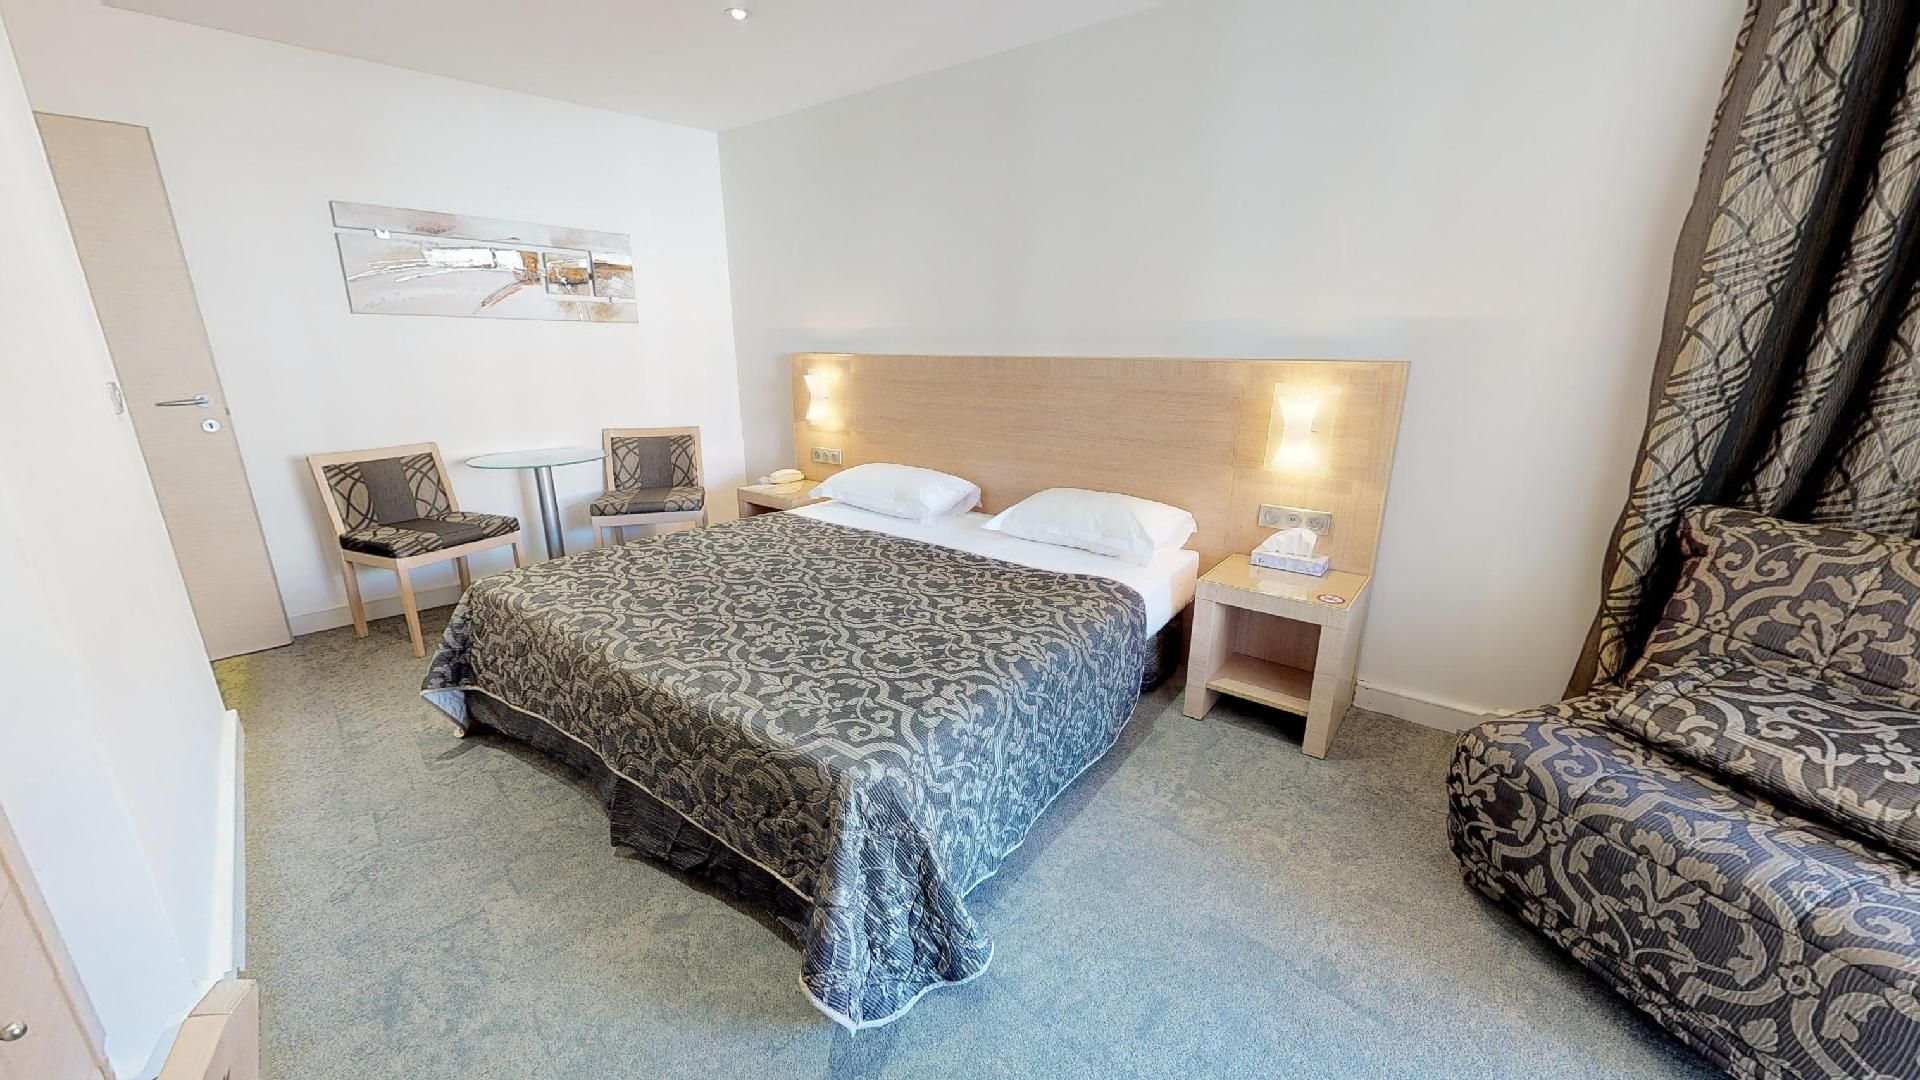 Tele Salle De Bain chambre hotel calvi le rocher | hébergement calvi balagne corse